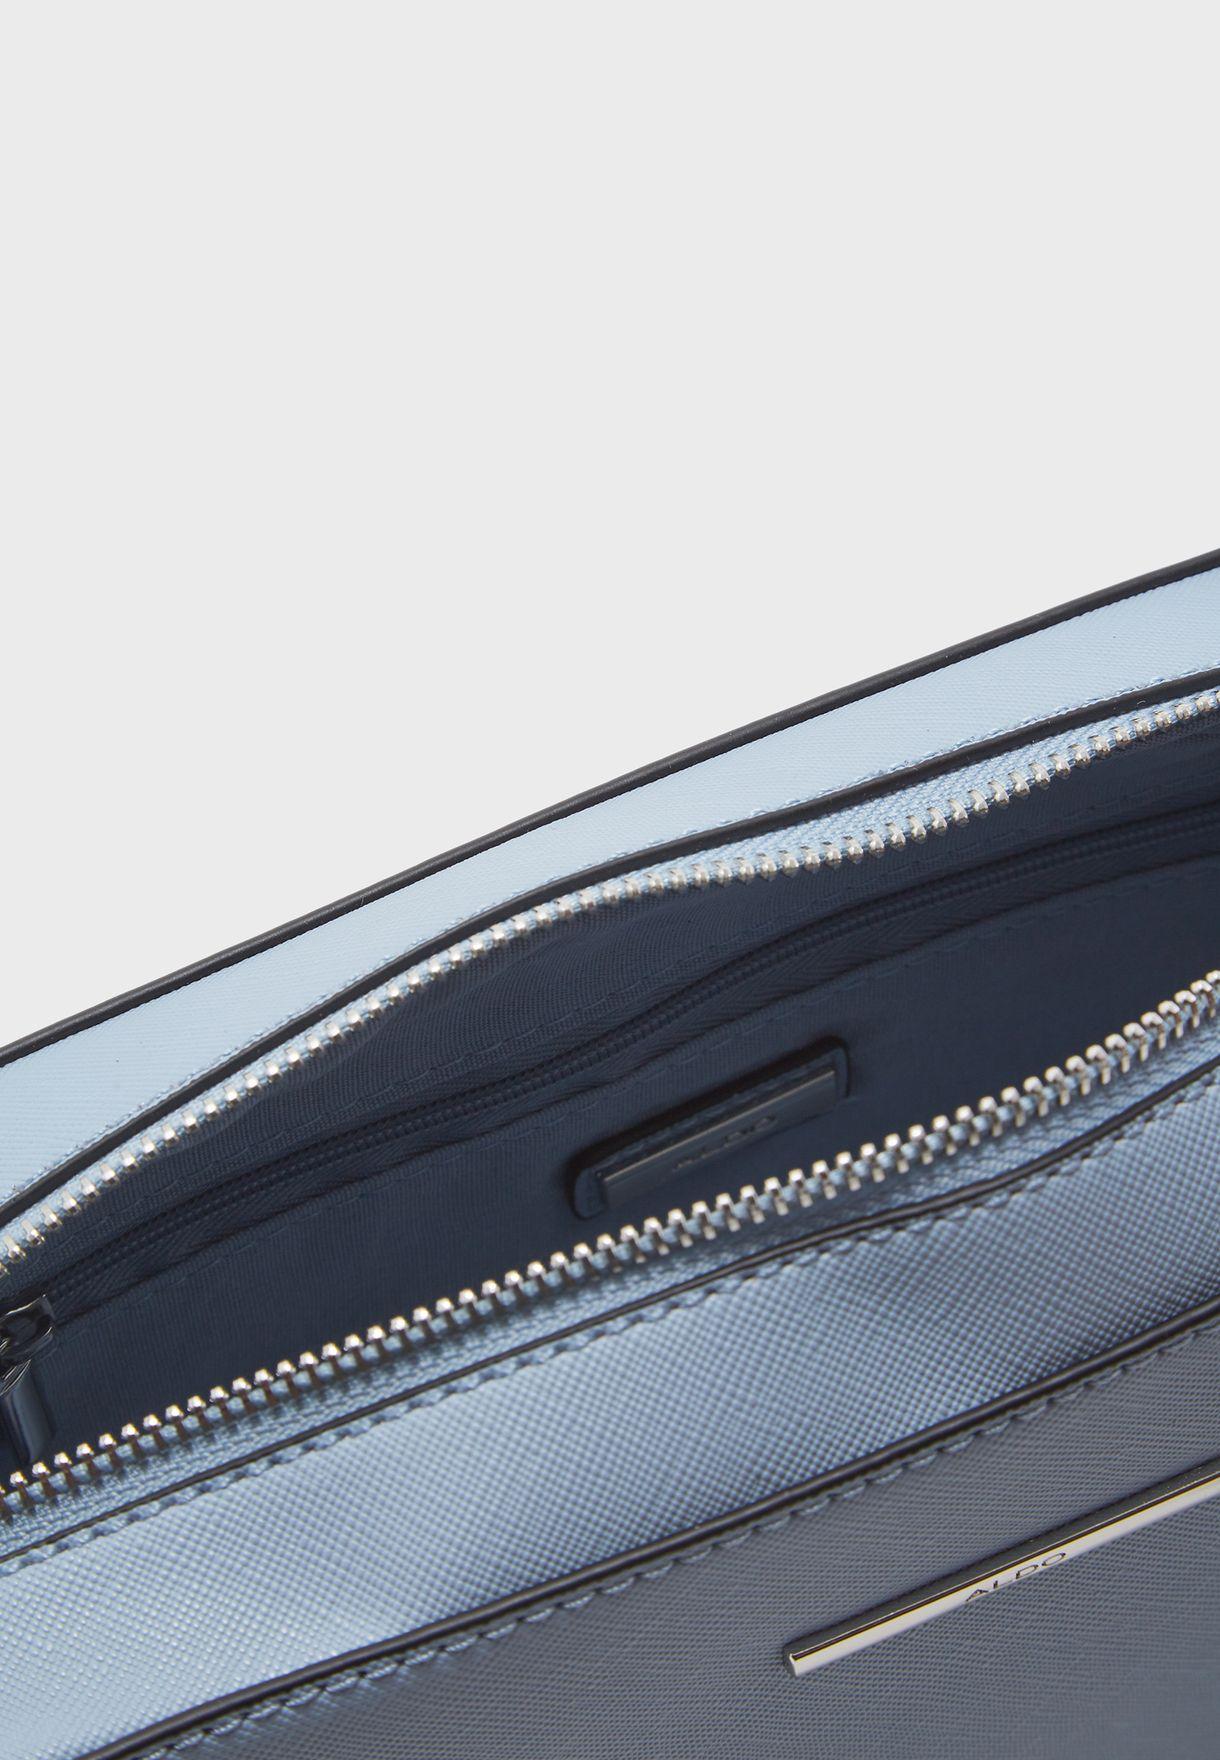 707baf73152 Shop Aldo blue Reform Crossbody ELROOII7 for Women in Saudi ...